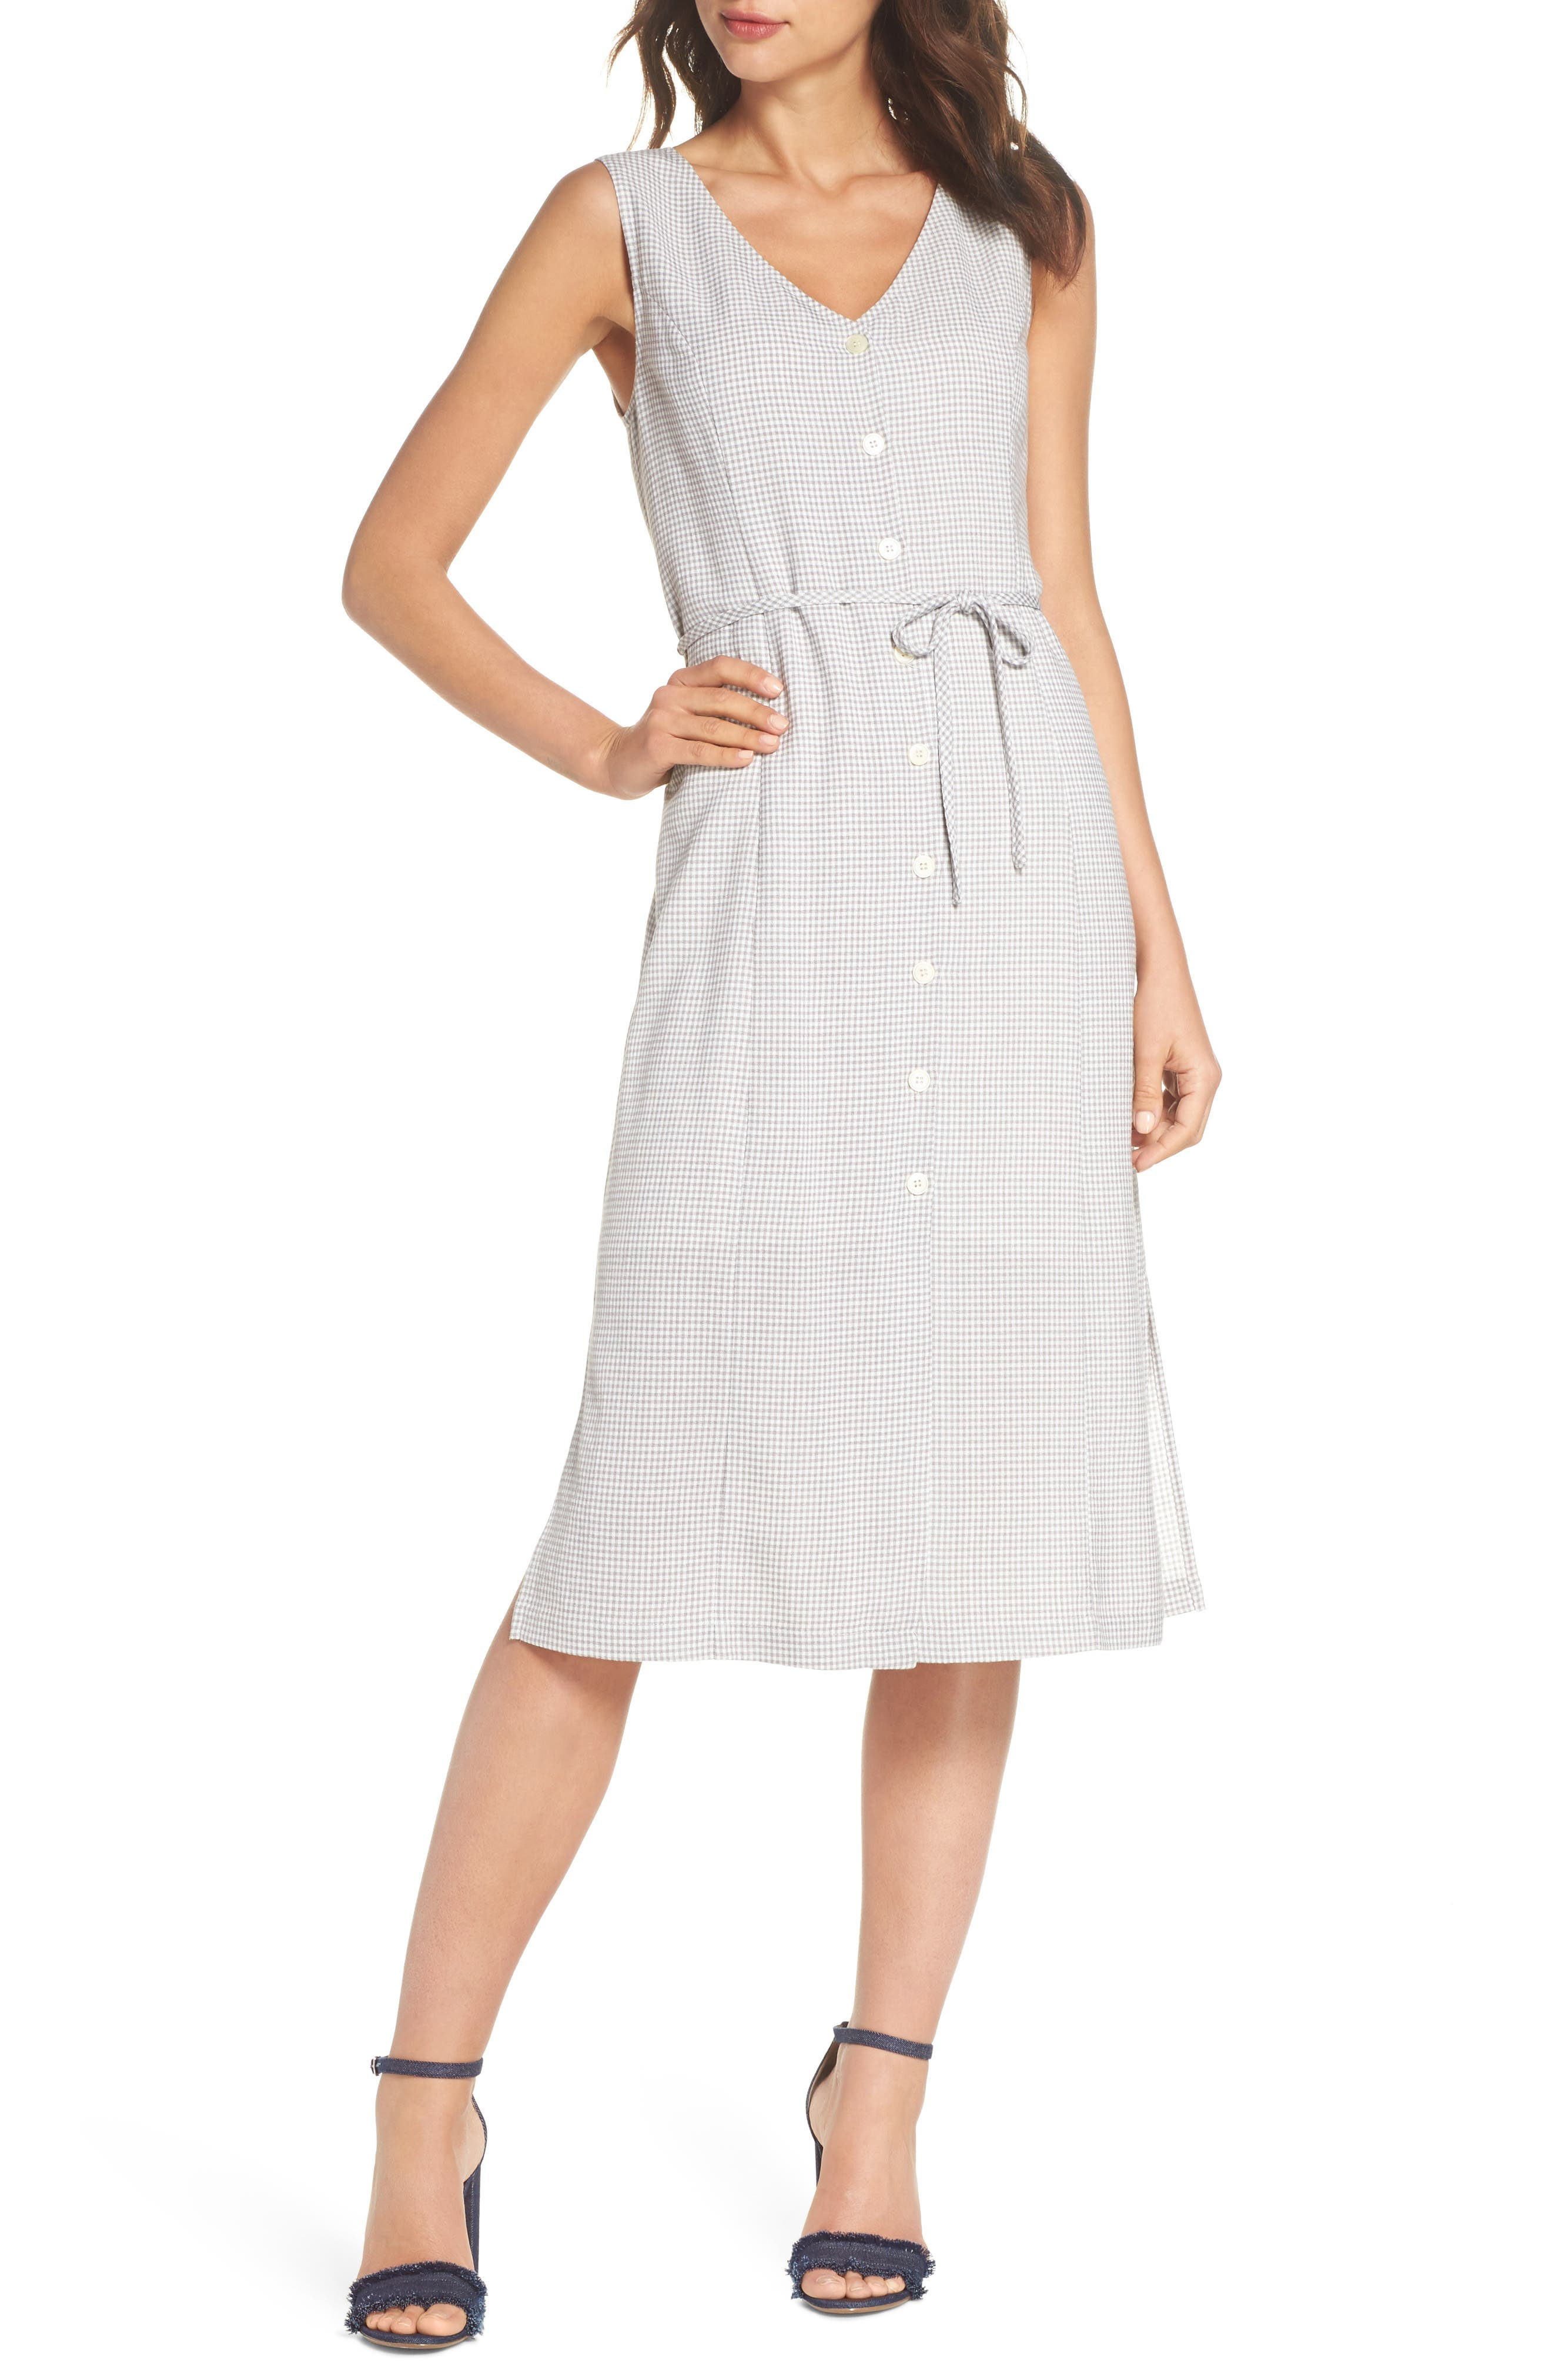 Gingham Midi Dress,                             Main thumbnail 1, color,                             Grey/ White